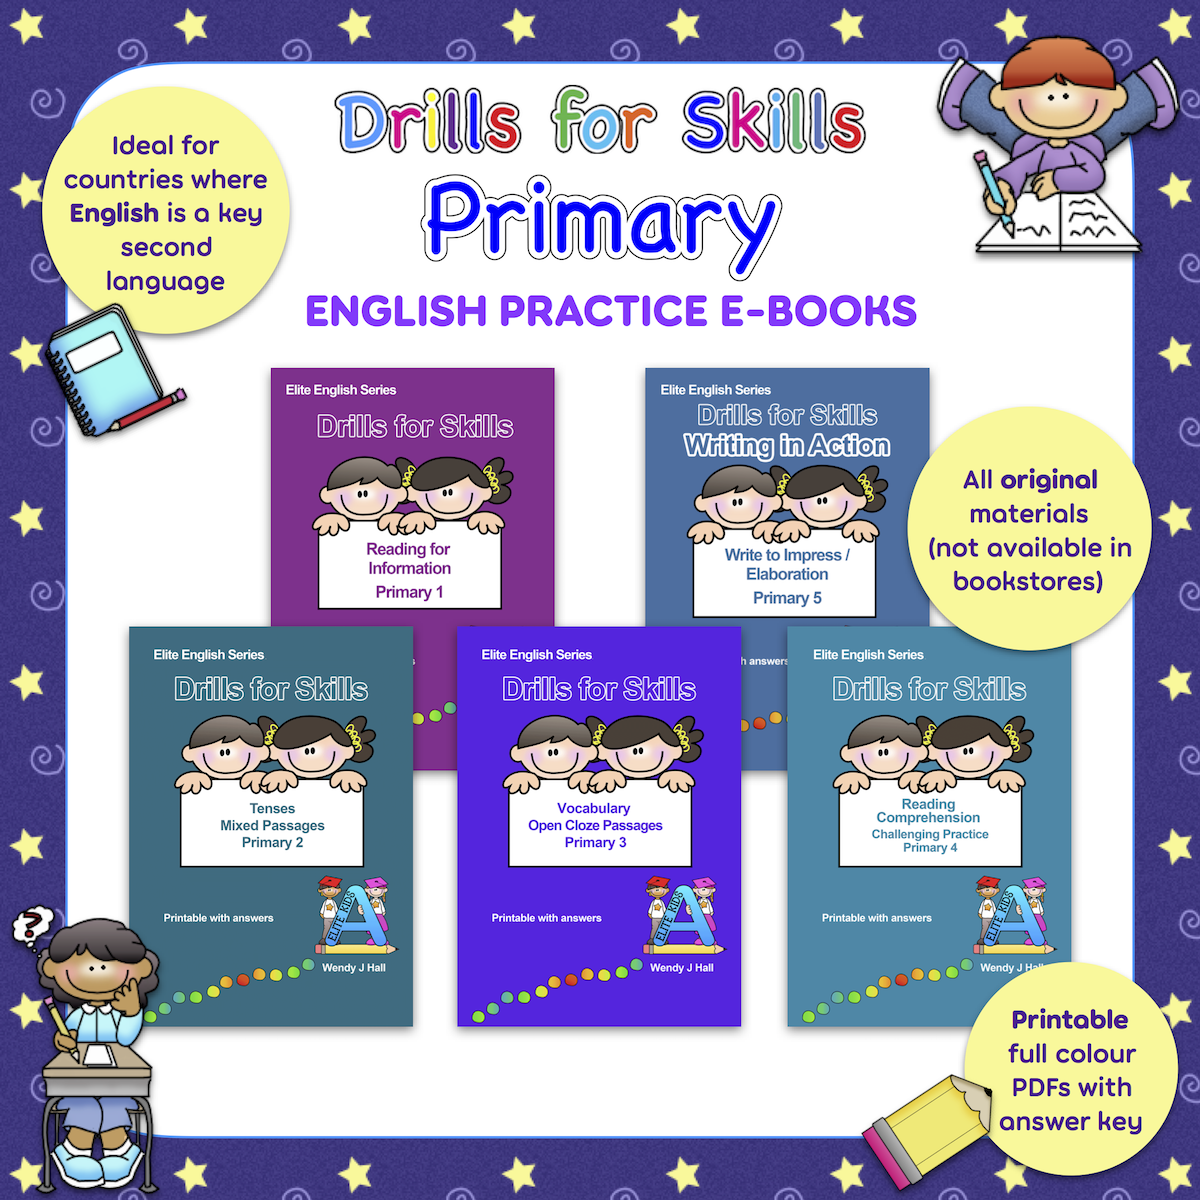 Drills for skills ebooks